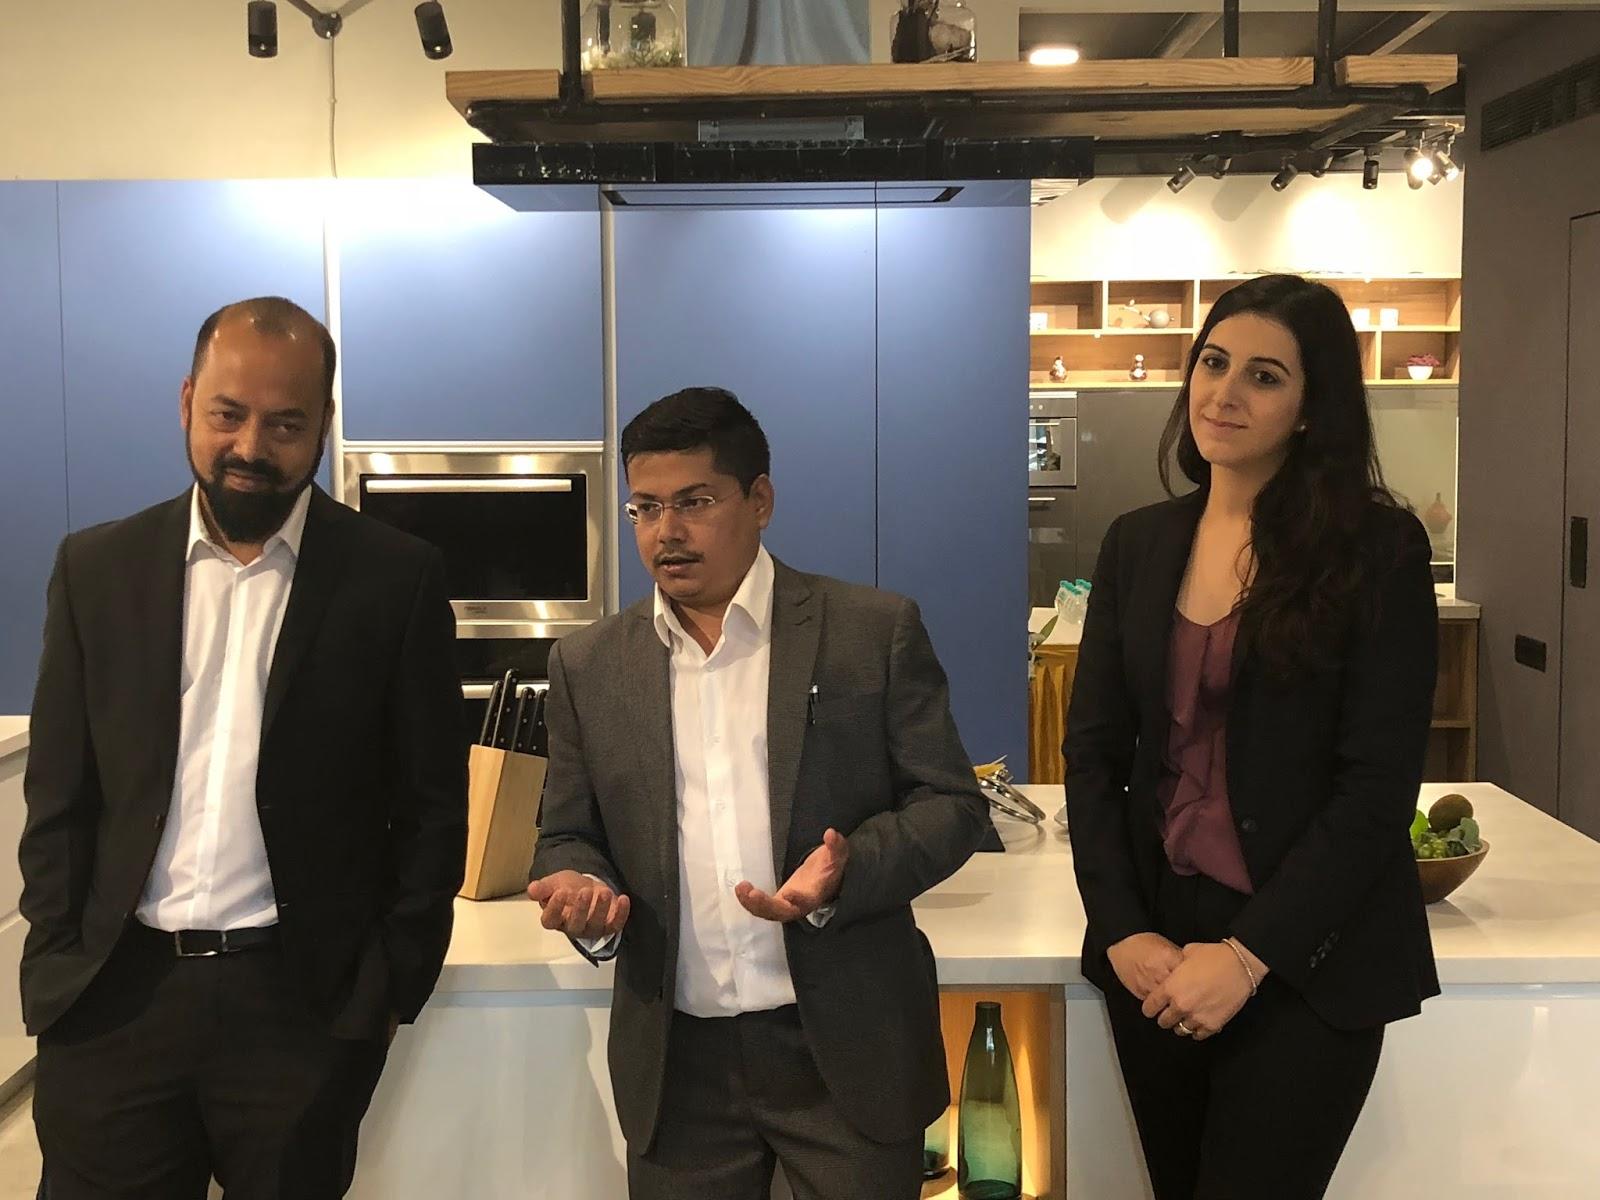 Wurfel Kuche Launches New Modular Kitchen & Wardrobes Outlet in Mumbai